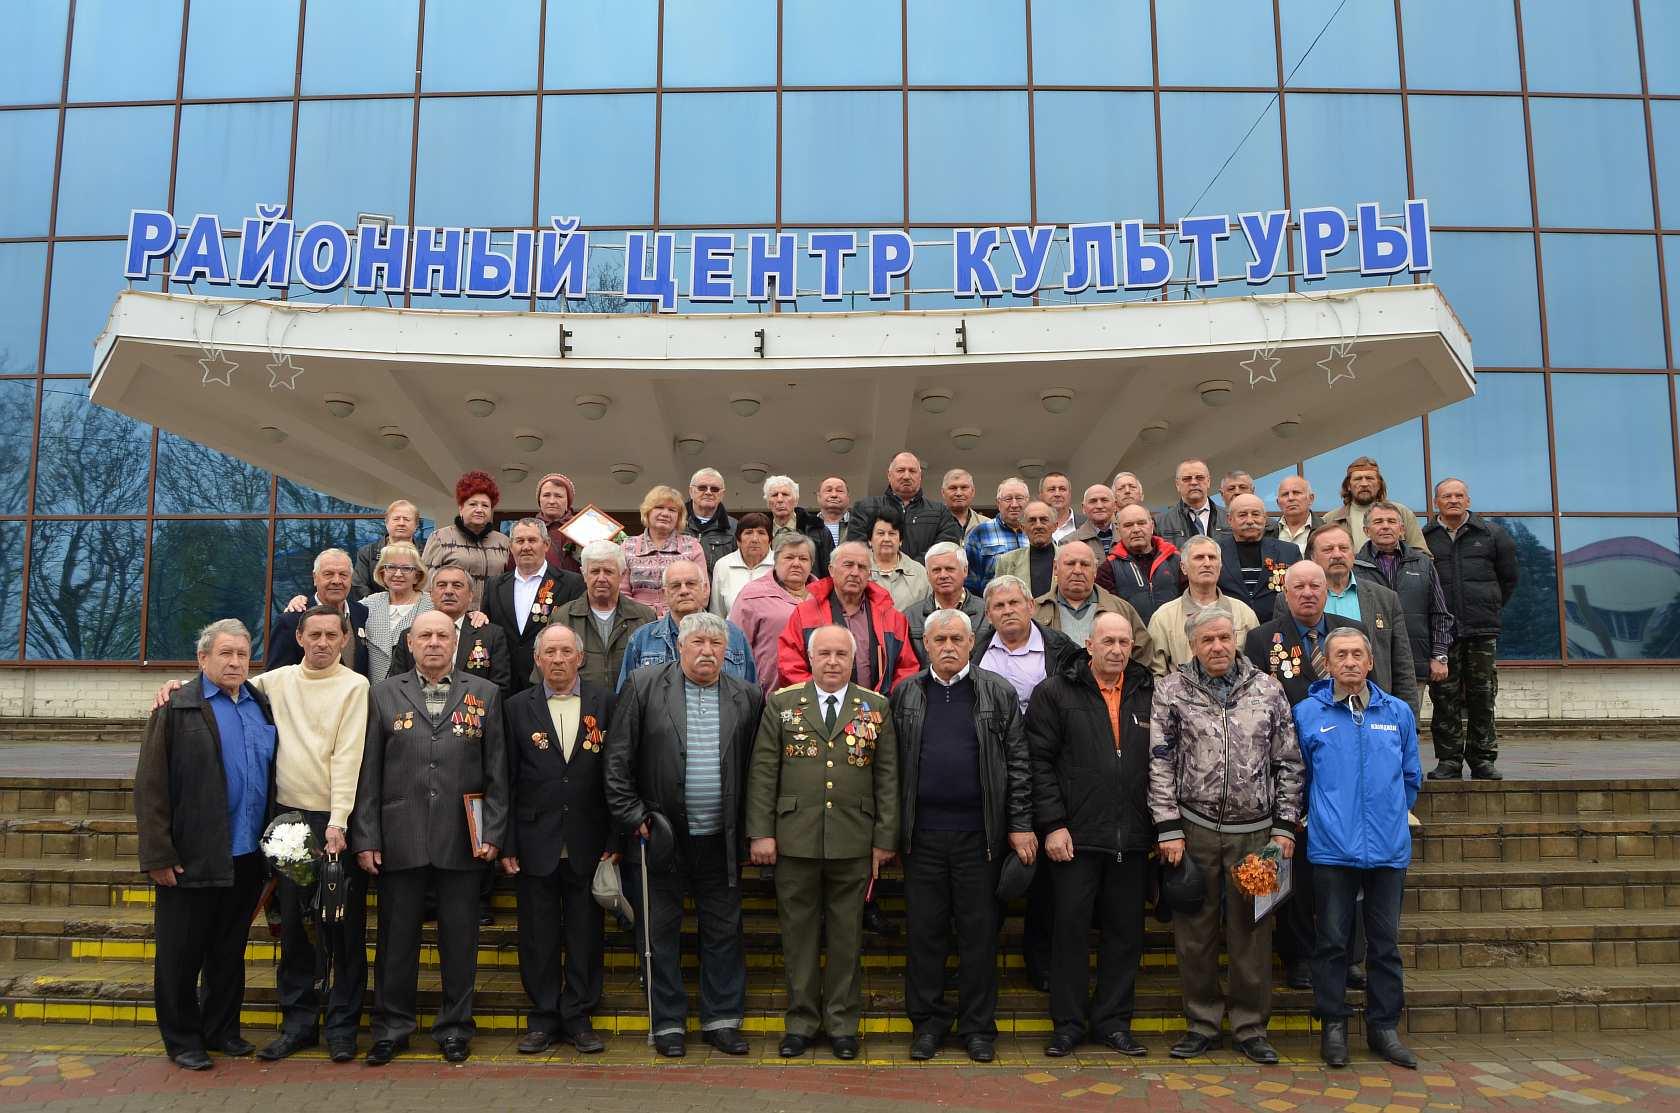 http://www.korenovsk.ru/wp-content/uploads/2017/04/DSC_0077.jpg